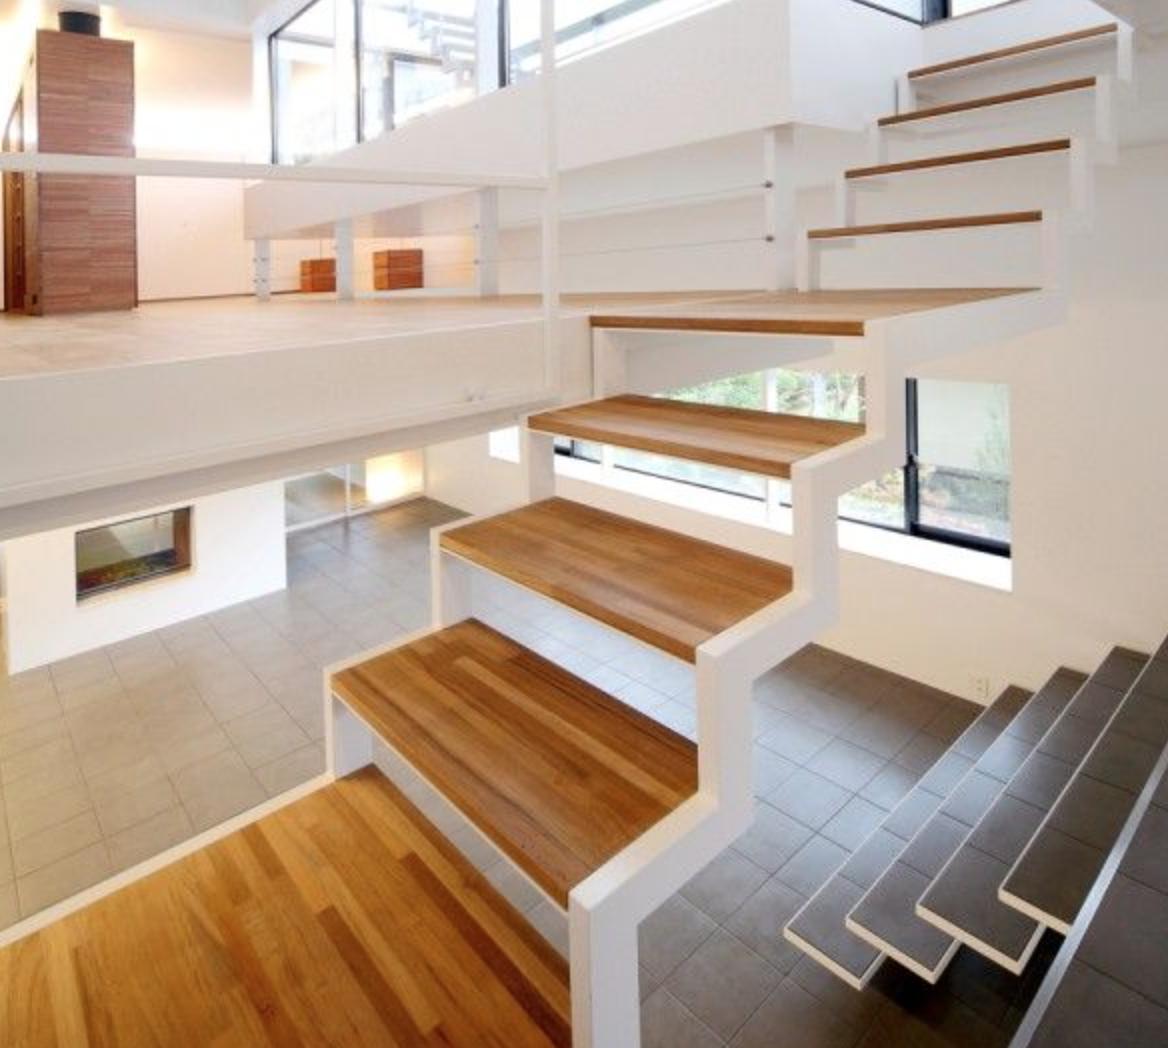 freie treppe wei stahl randger st holz elemente treppe pinterest treppe wei stahl und. Black Bedroom Furniture Sets. Home Design Ideas